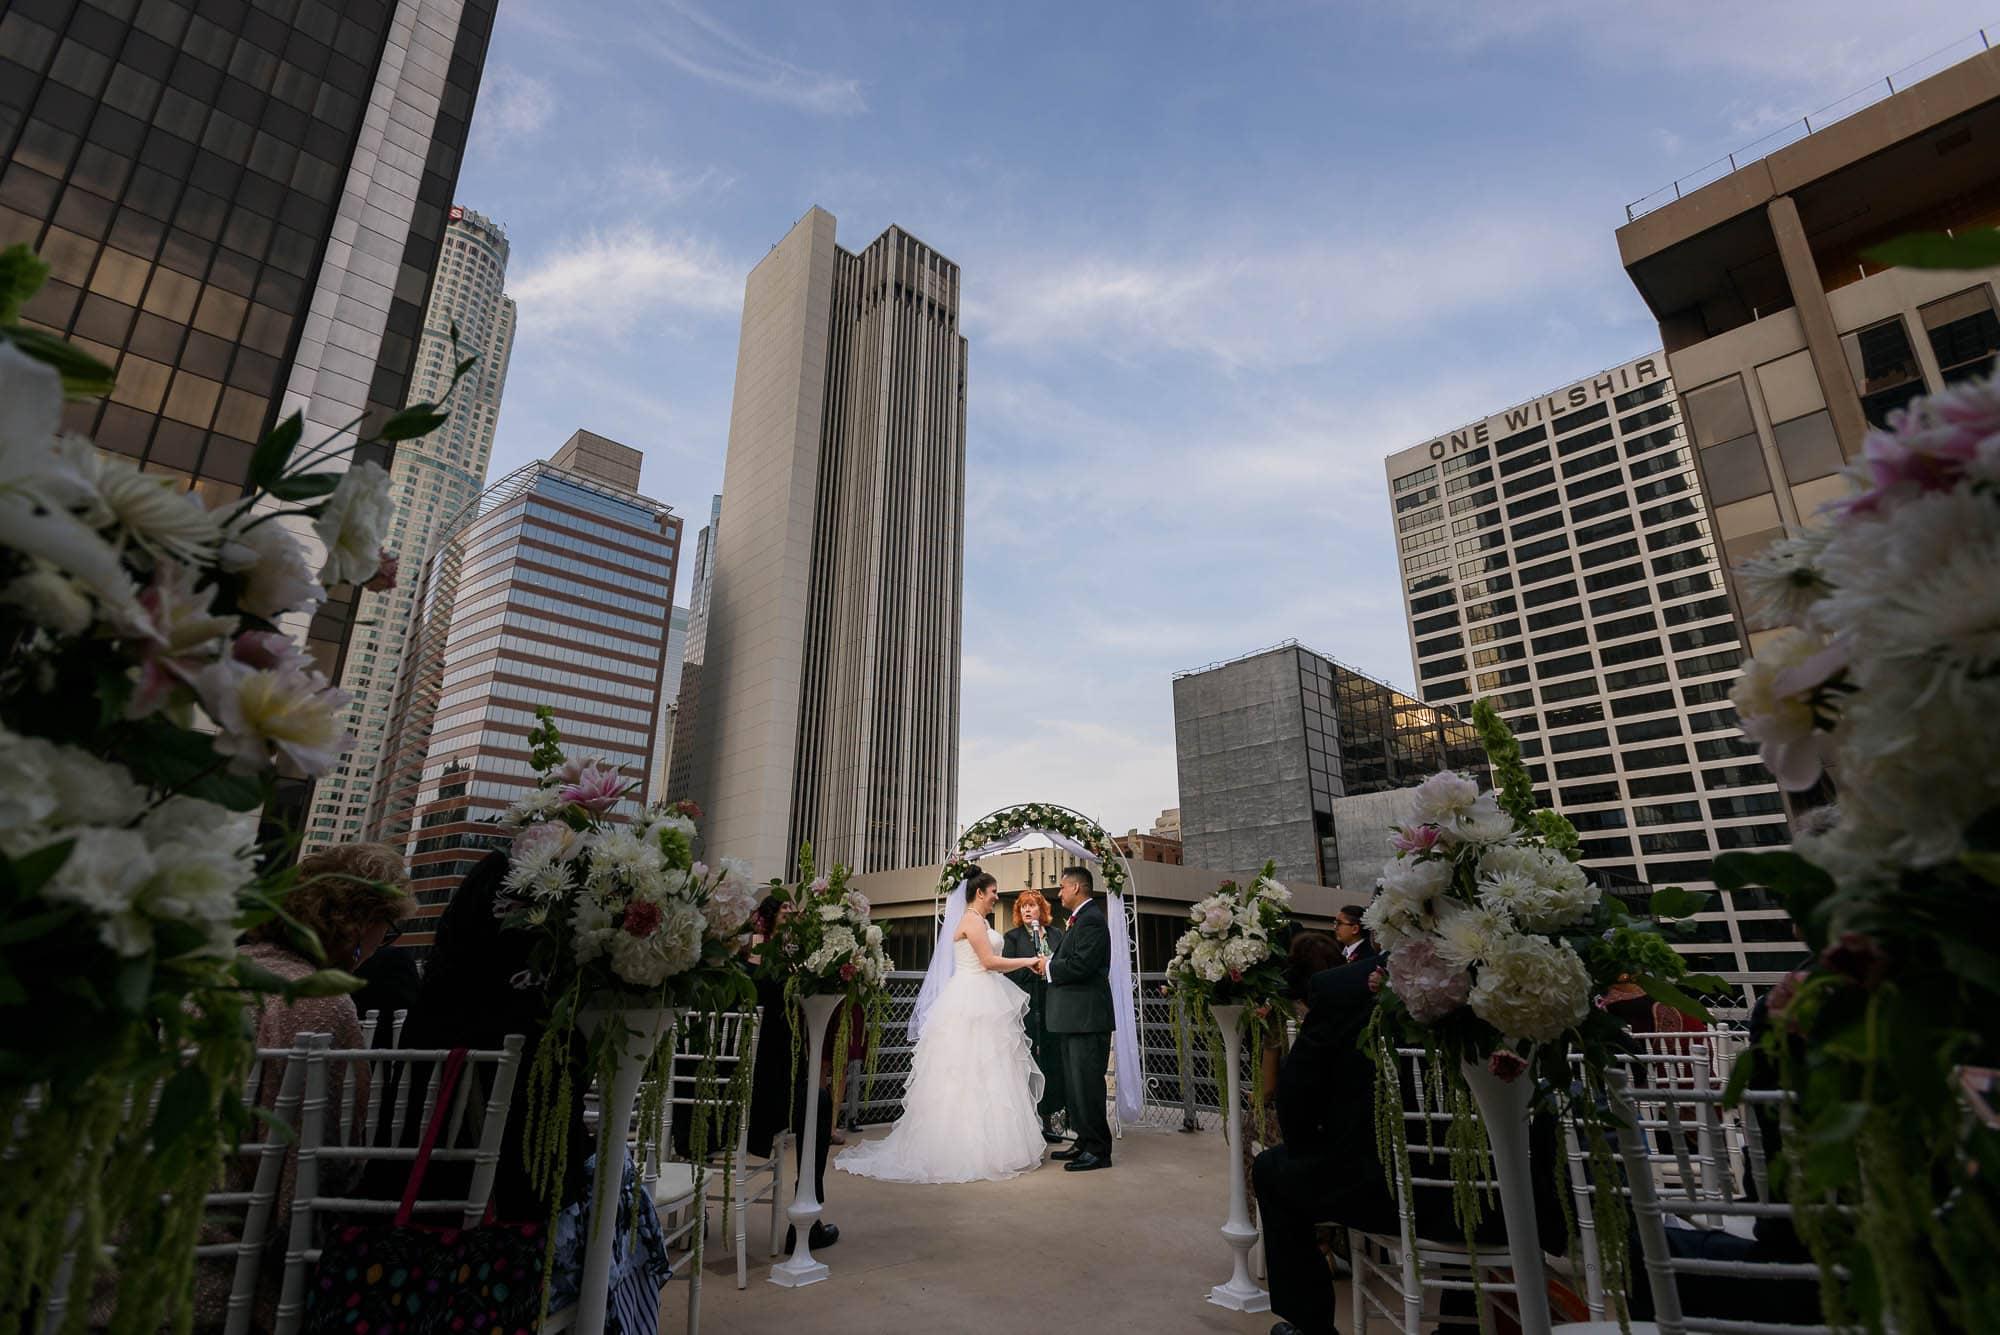 019_Alan_and_Heidi_Wedding_Nicole_Roman